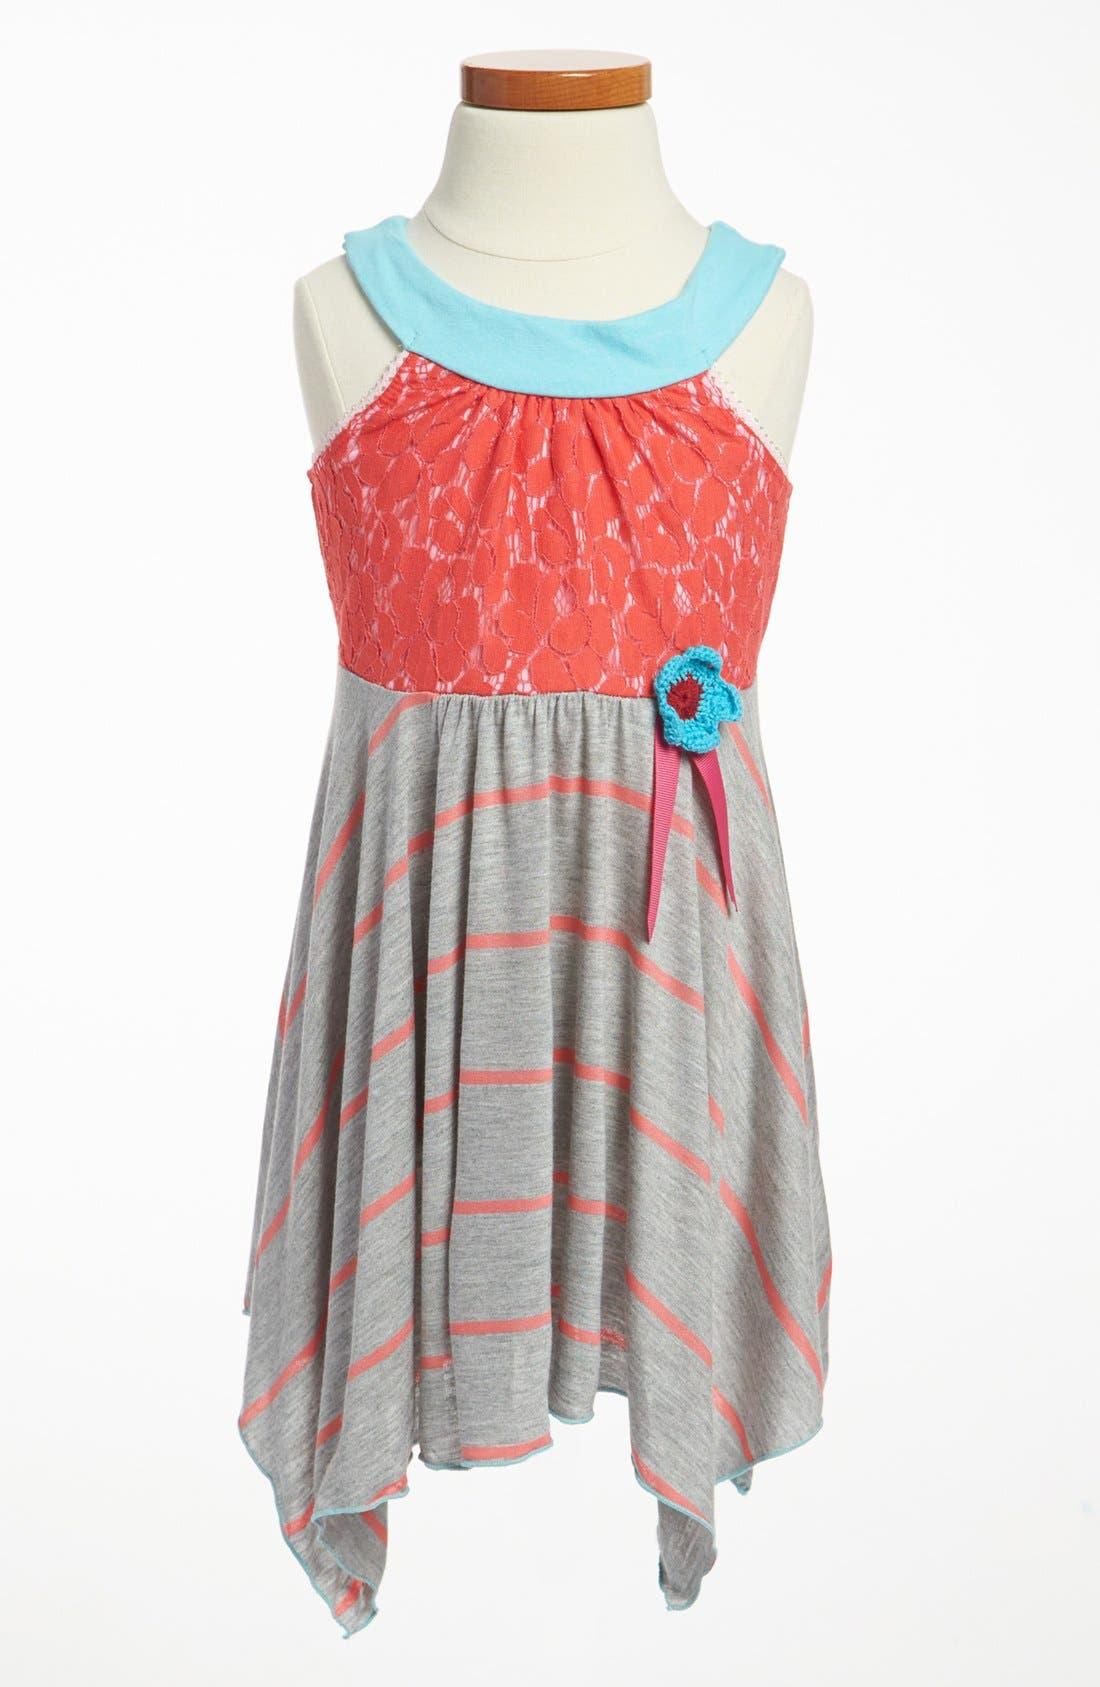 Alternate Image 1 Selected - Ella and Lulu Tank Dress (Toddler Girls)